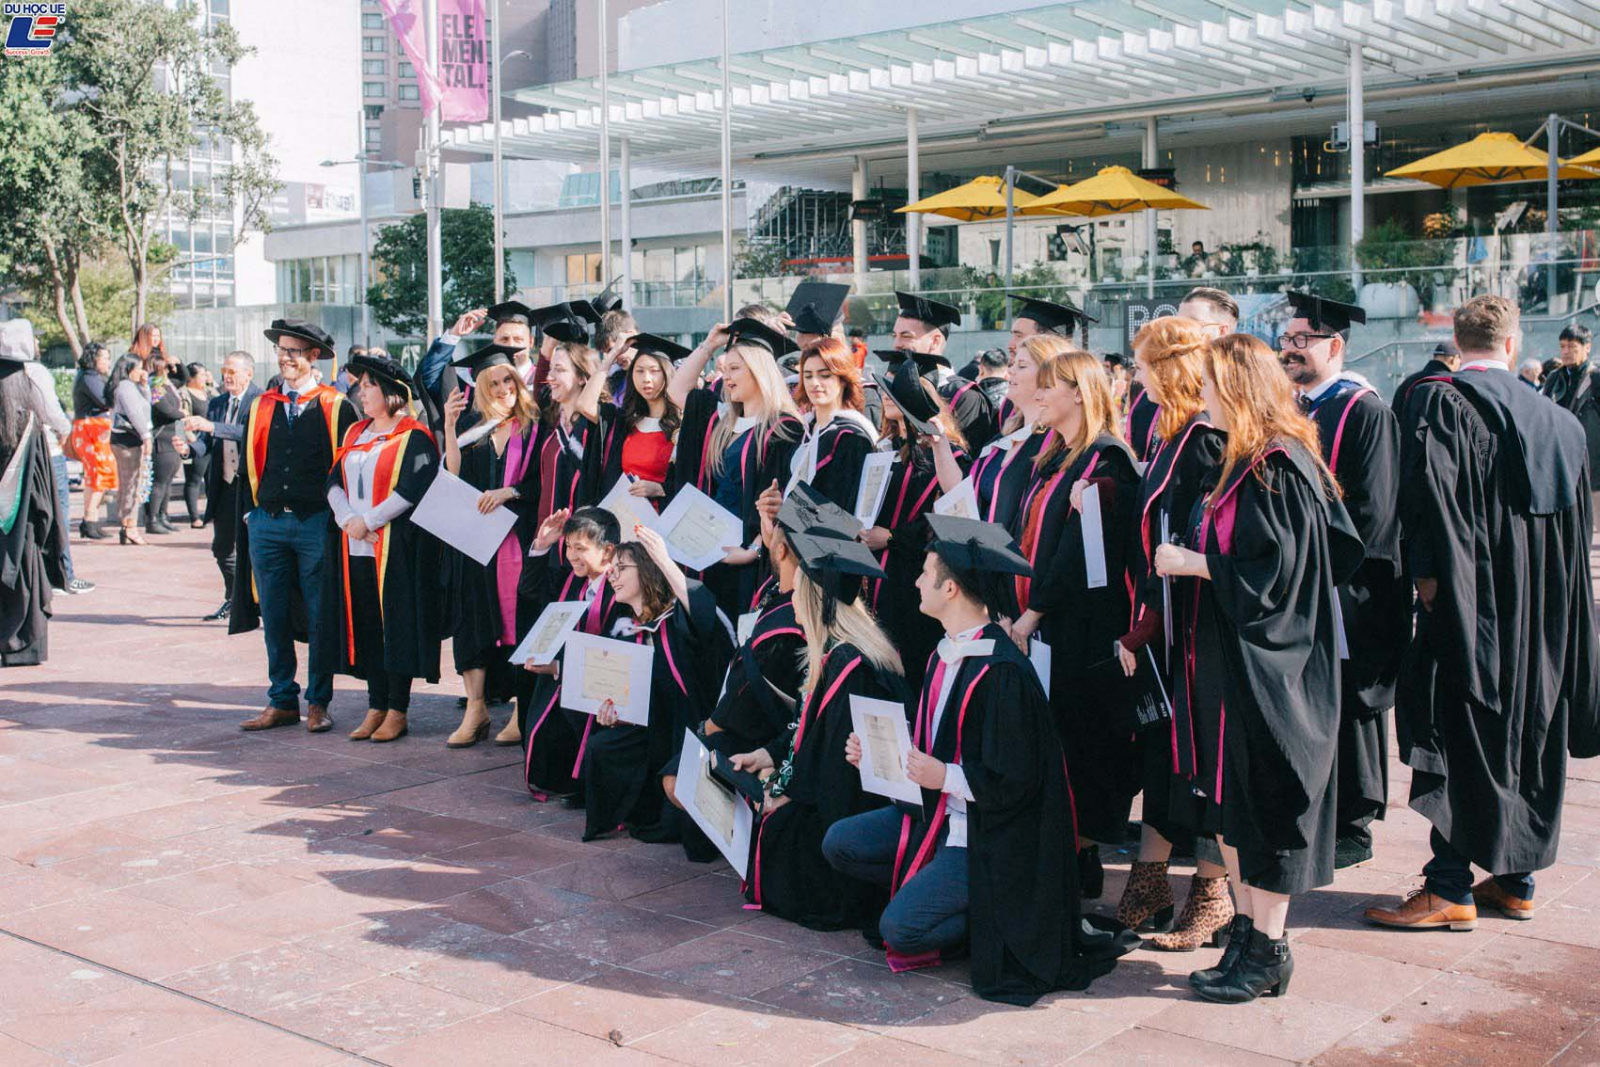 Du học New Zealand - Tổng quan về giáo dục New Zealand 4